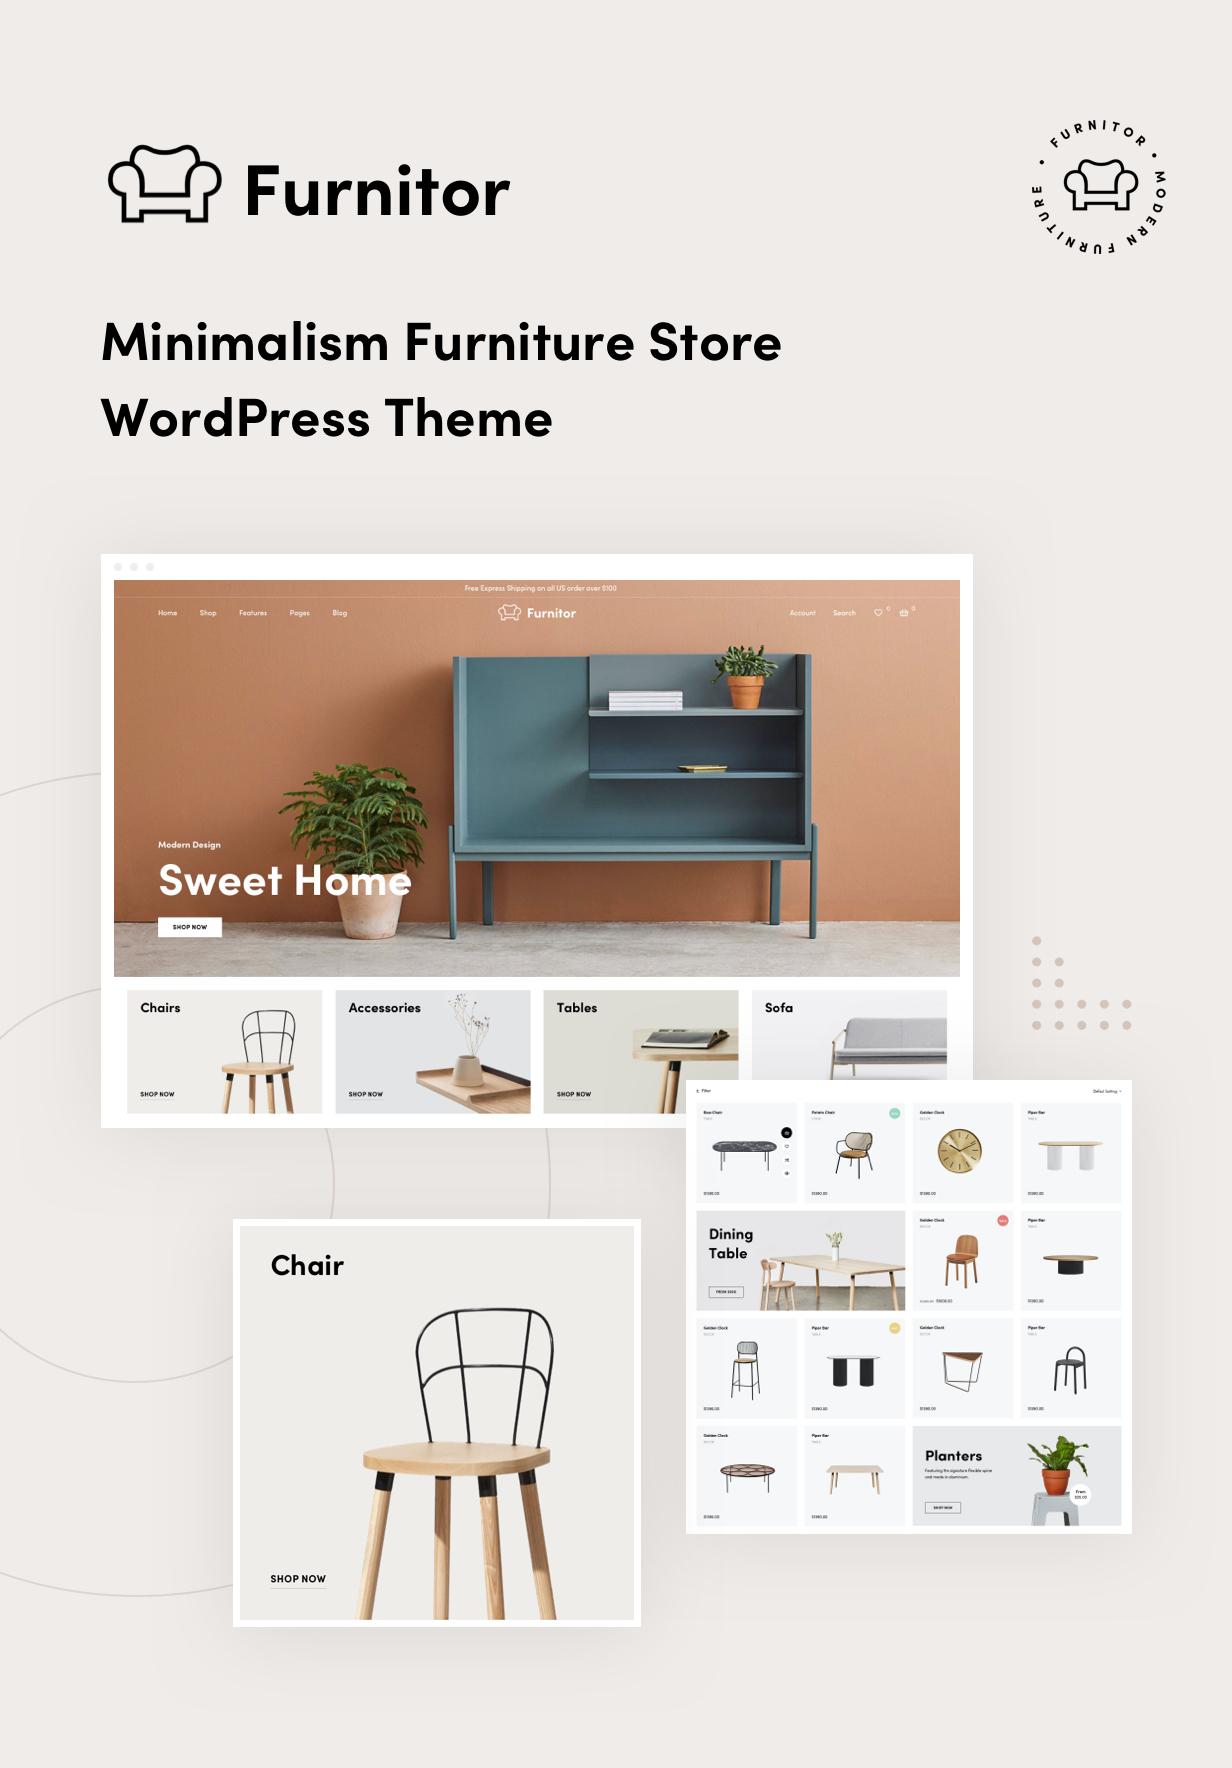 Furnitor – Minimalism Furniture Store WordPress Theme - 9